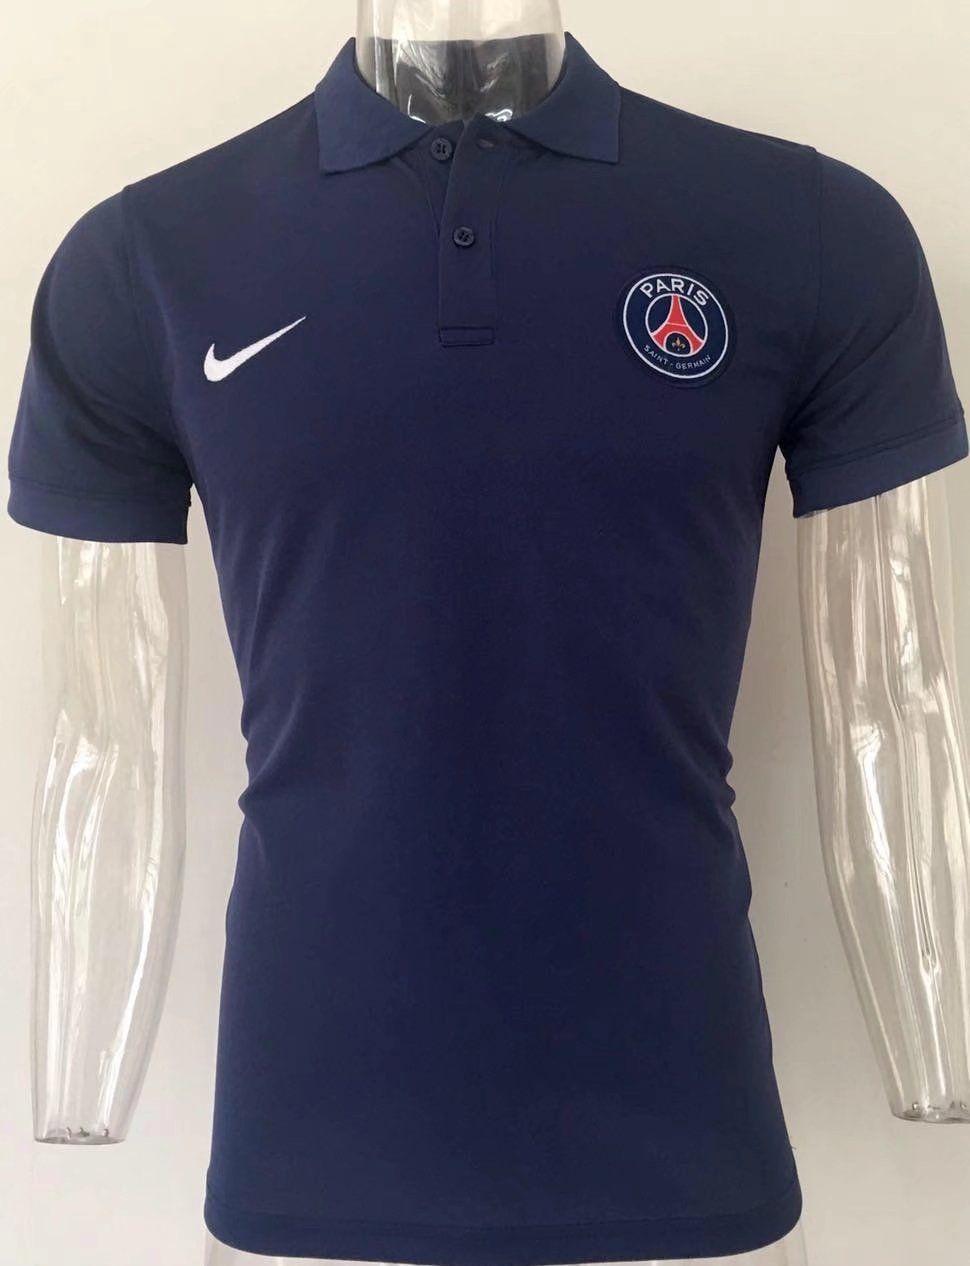 on sale 79179 7db0f Pin by Yxjersey on 17/18 PSG Neymar JR soccer jerseys ...